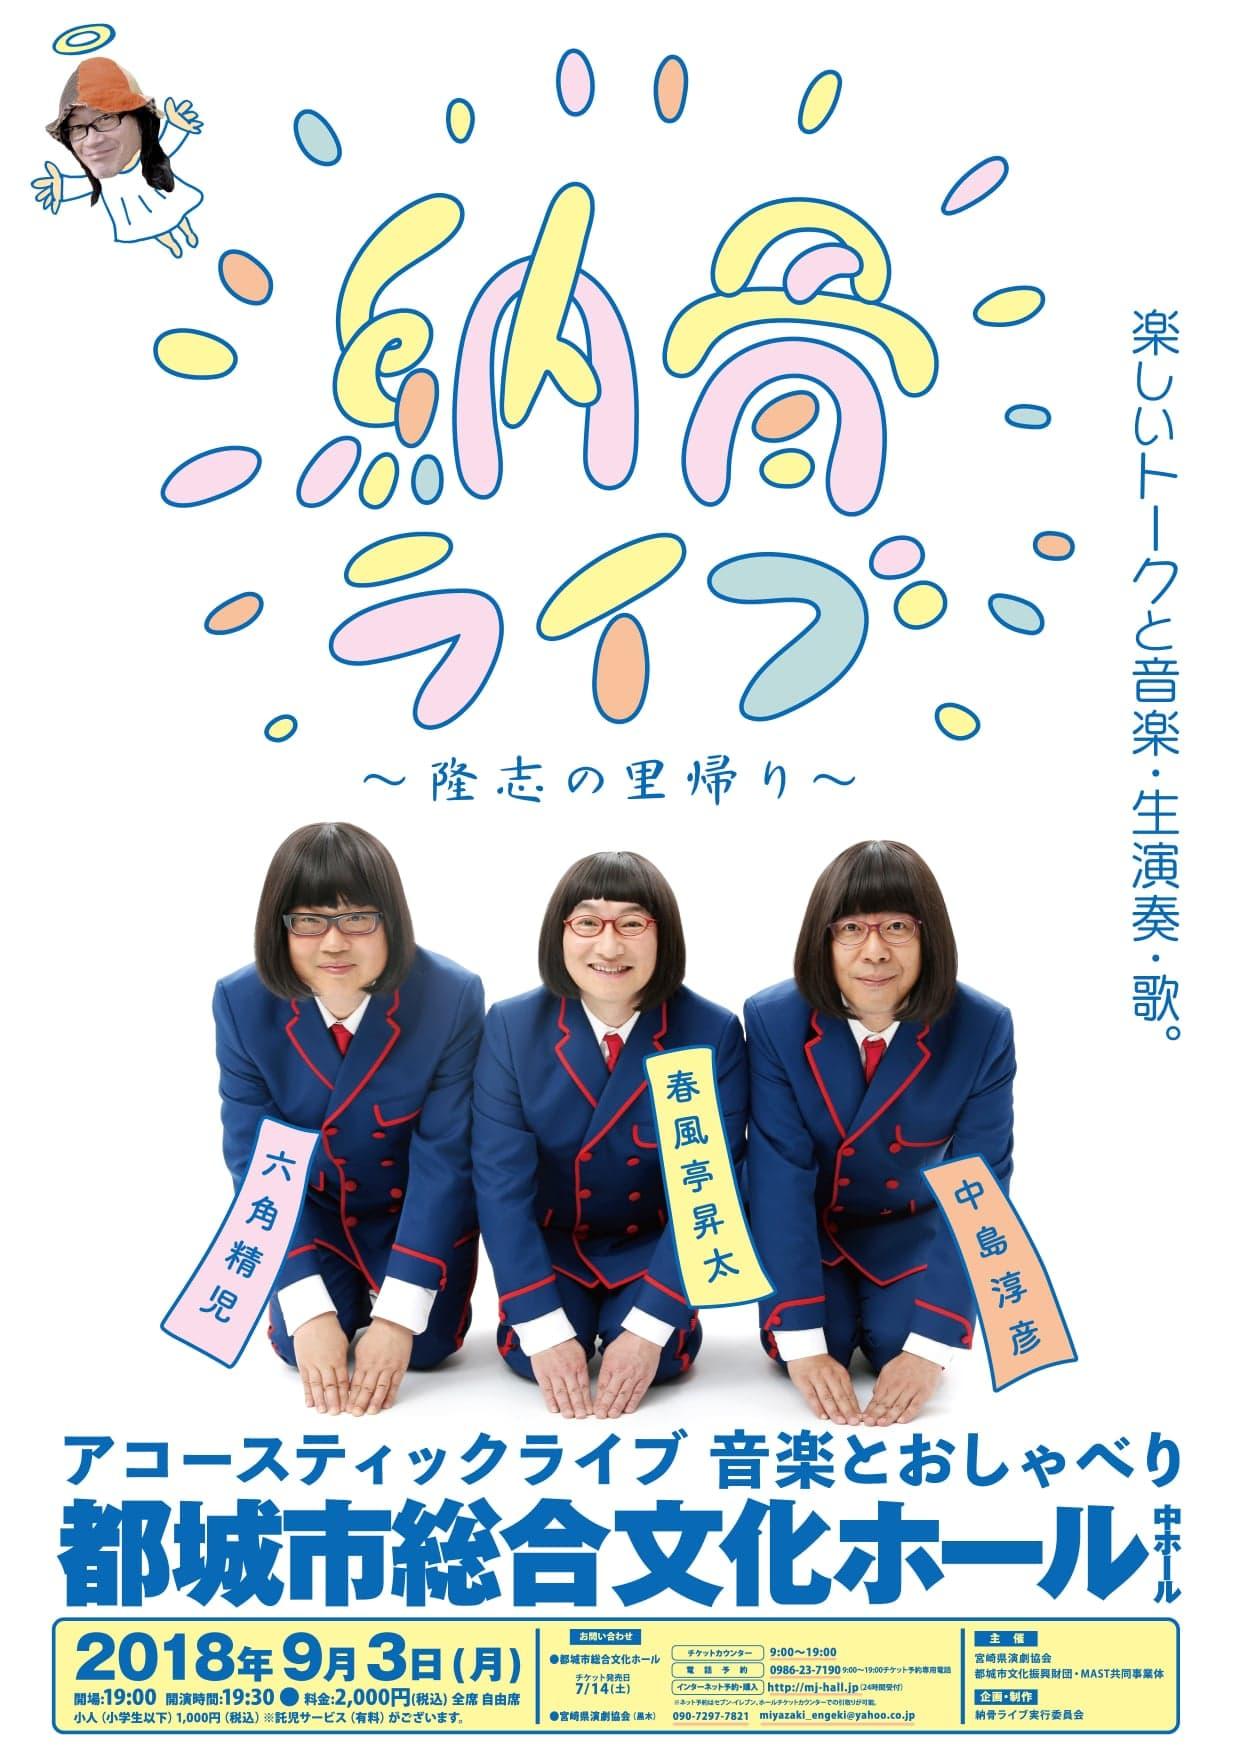 http://mj-hall.jp/performance/300903noukotsu%20omote.jpg